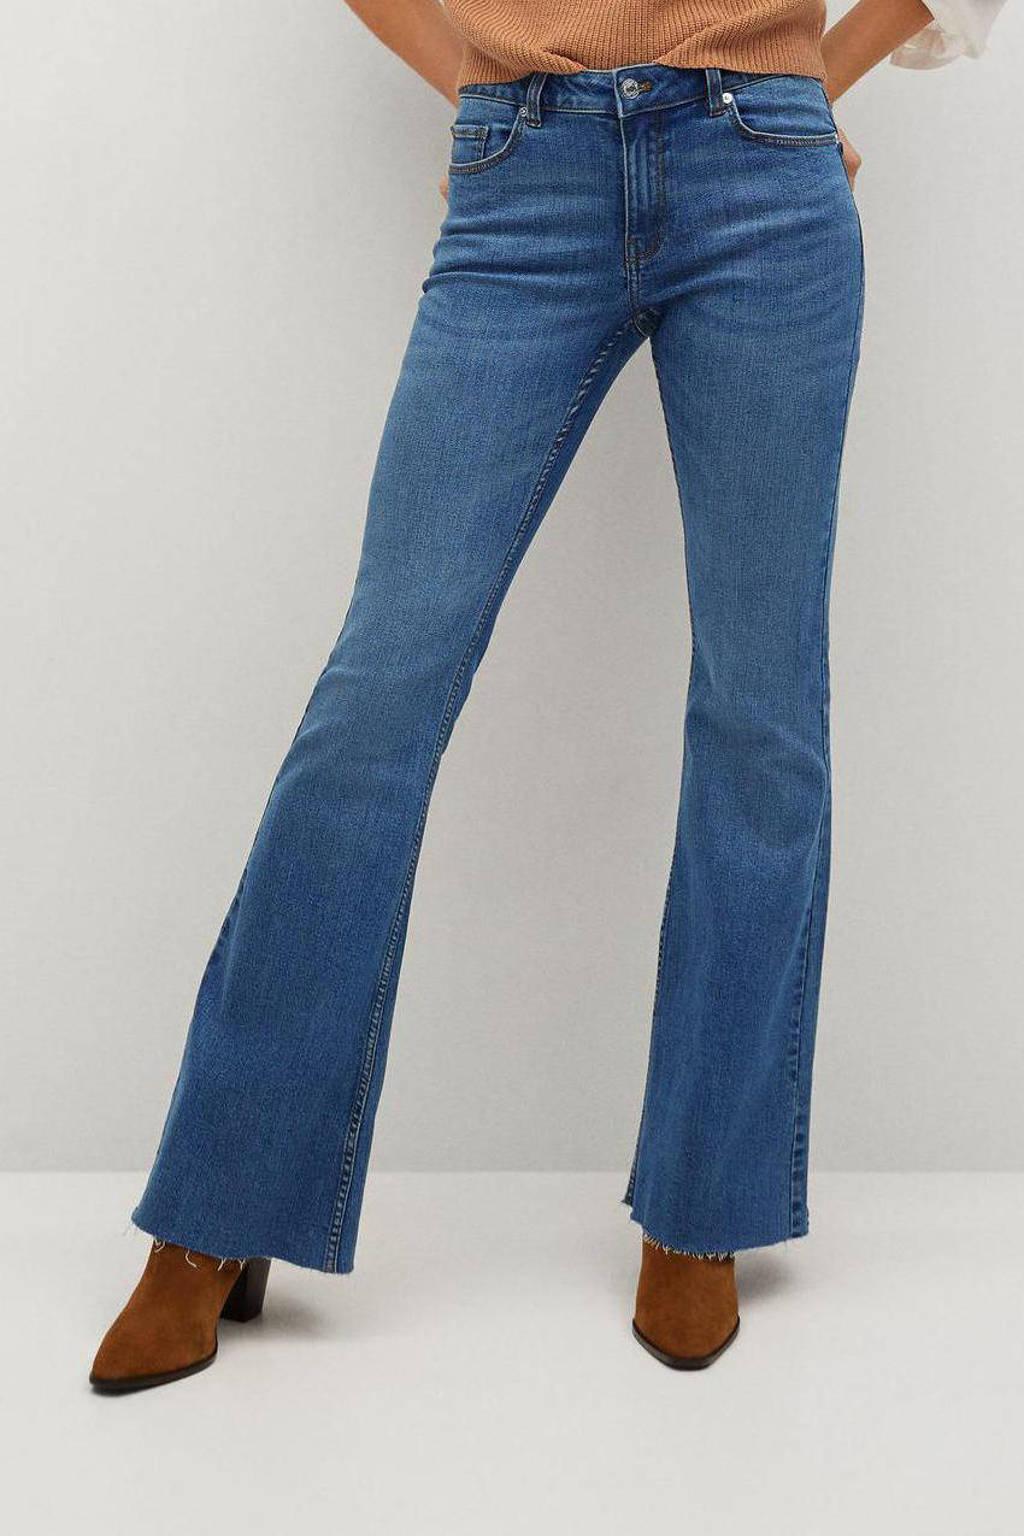 Mango flared jeans blue